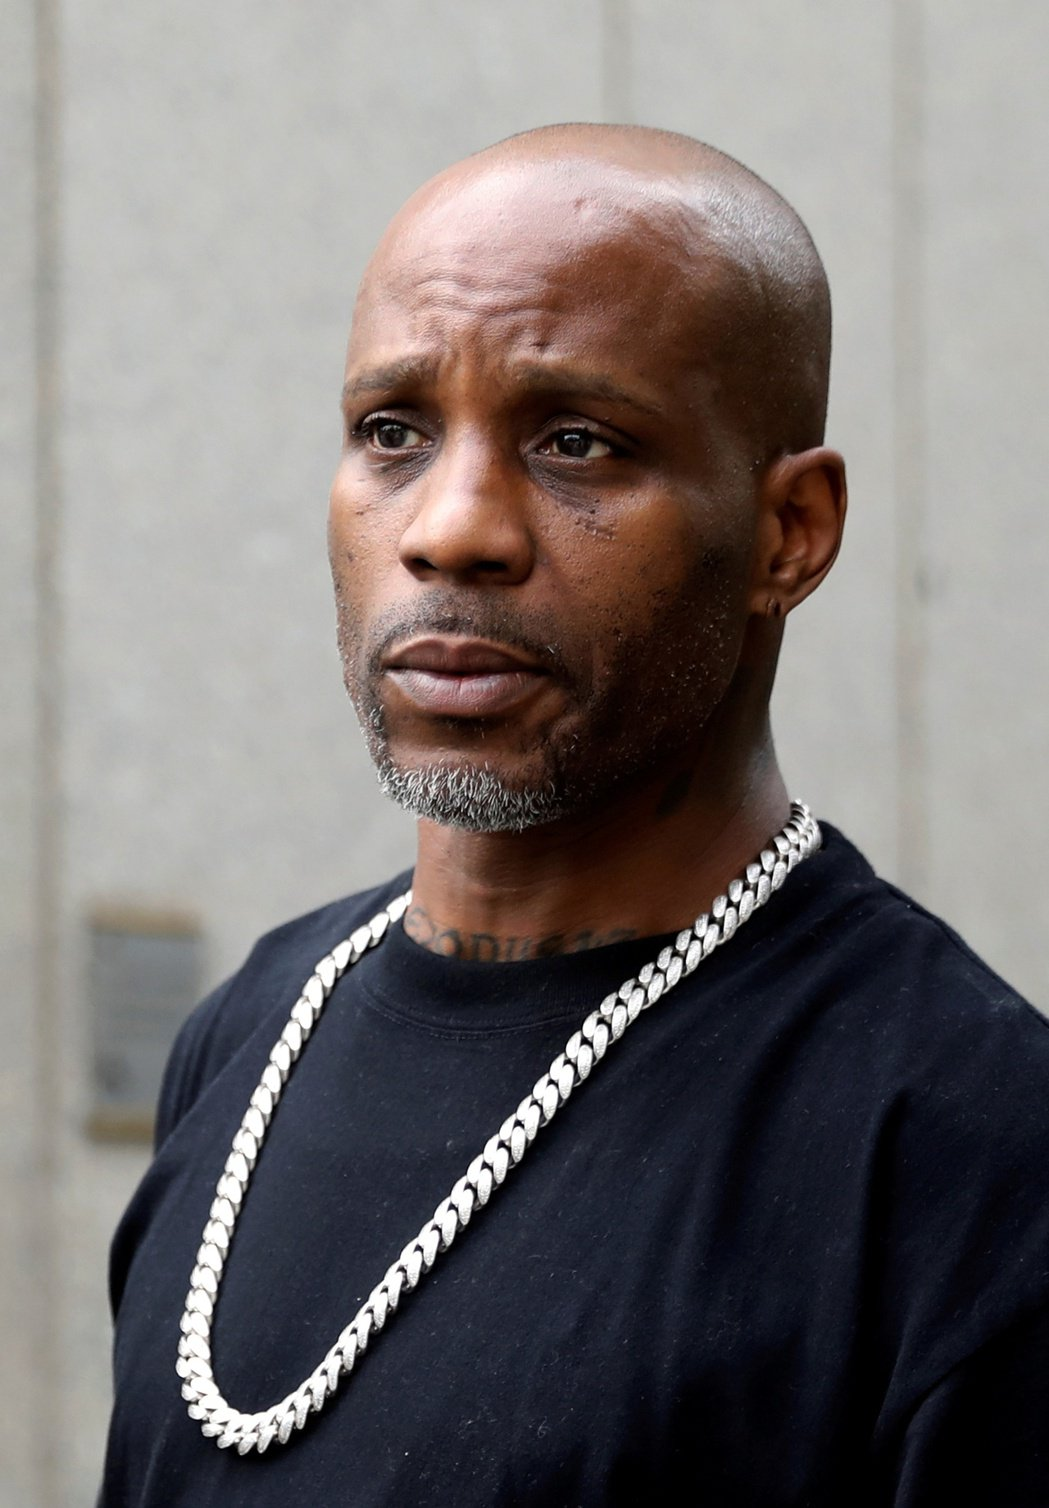 DMX去世讓娛樂圈不少重量級黑人藝人在社群網站上發文哀悼。圖/路透資料照片